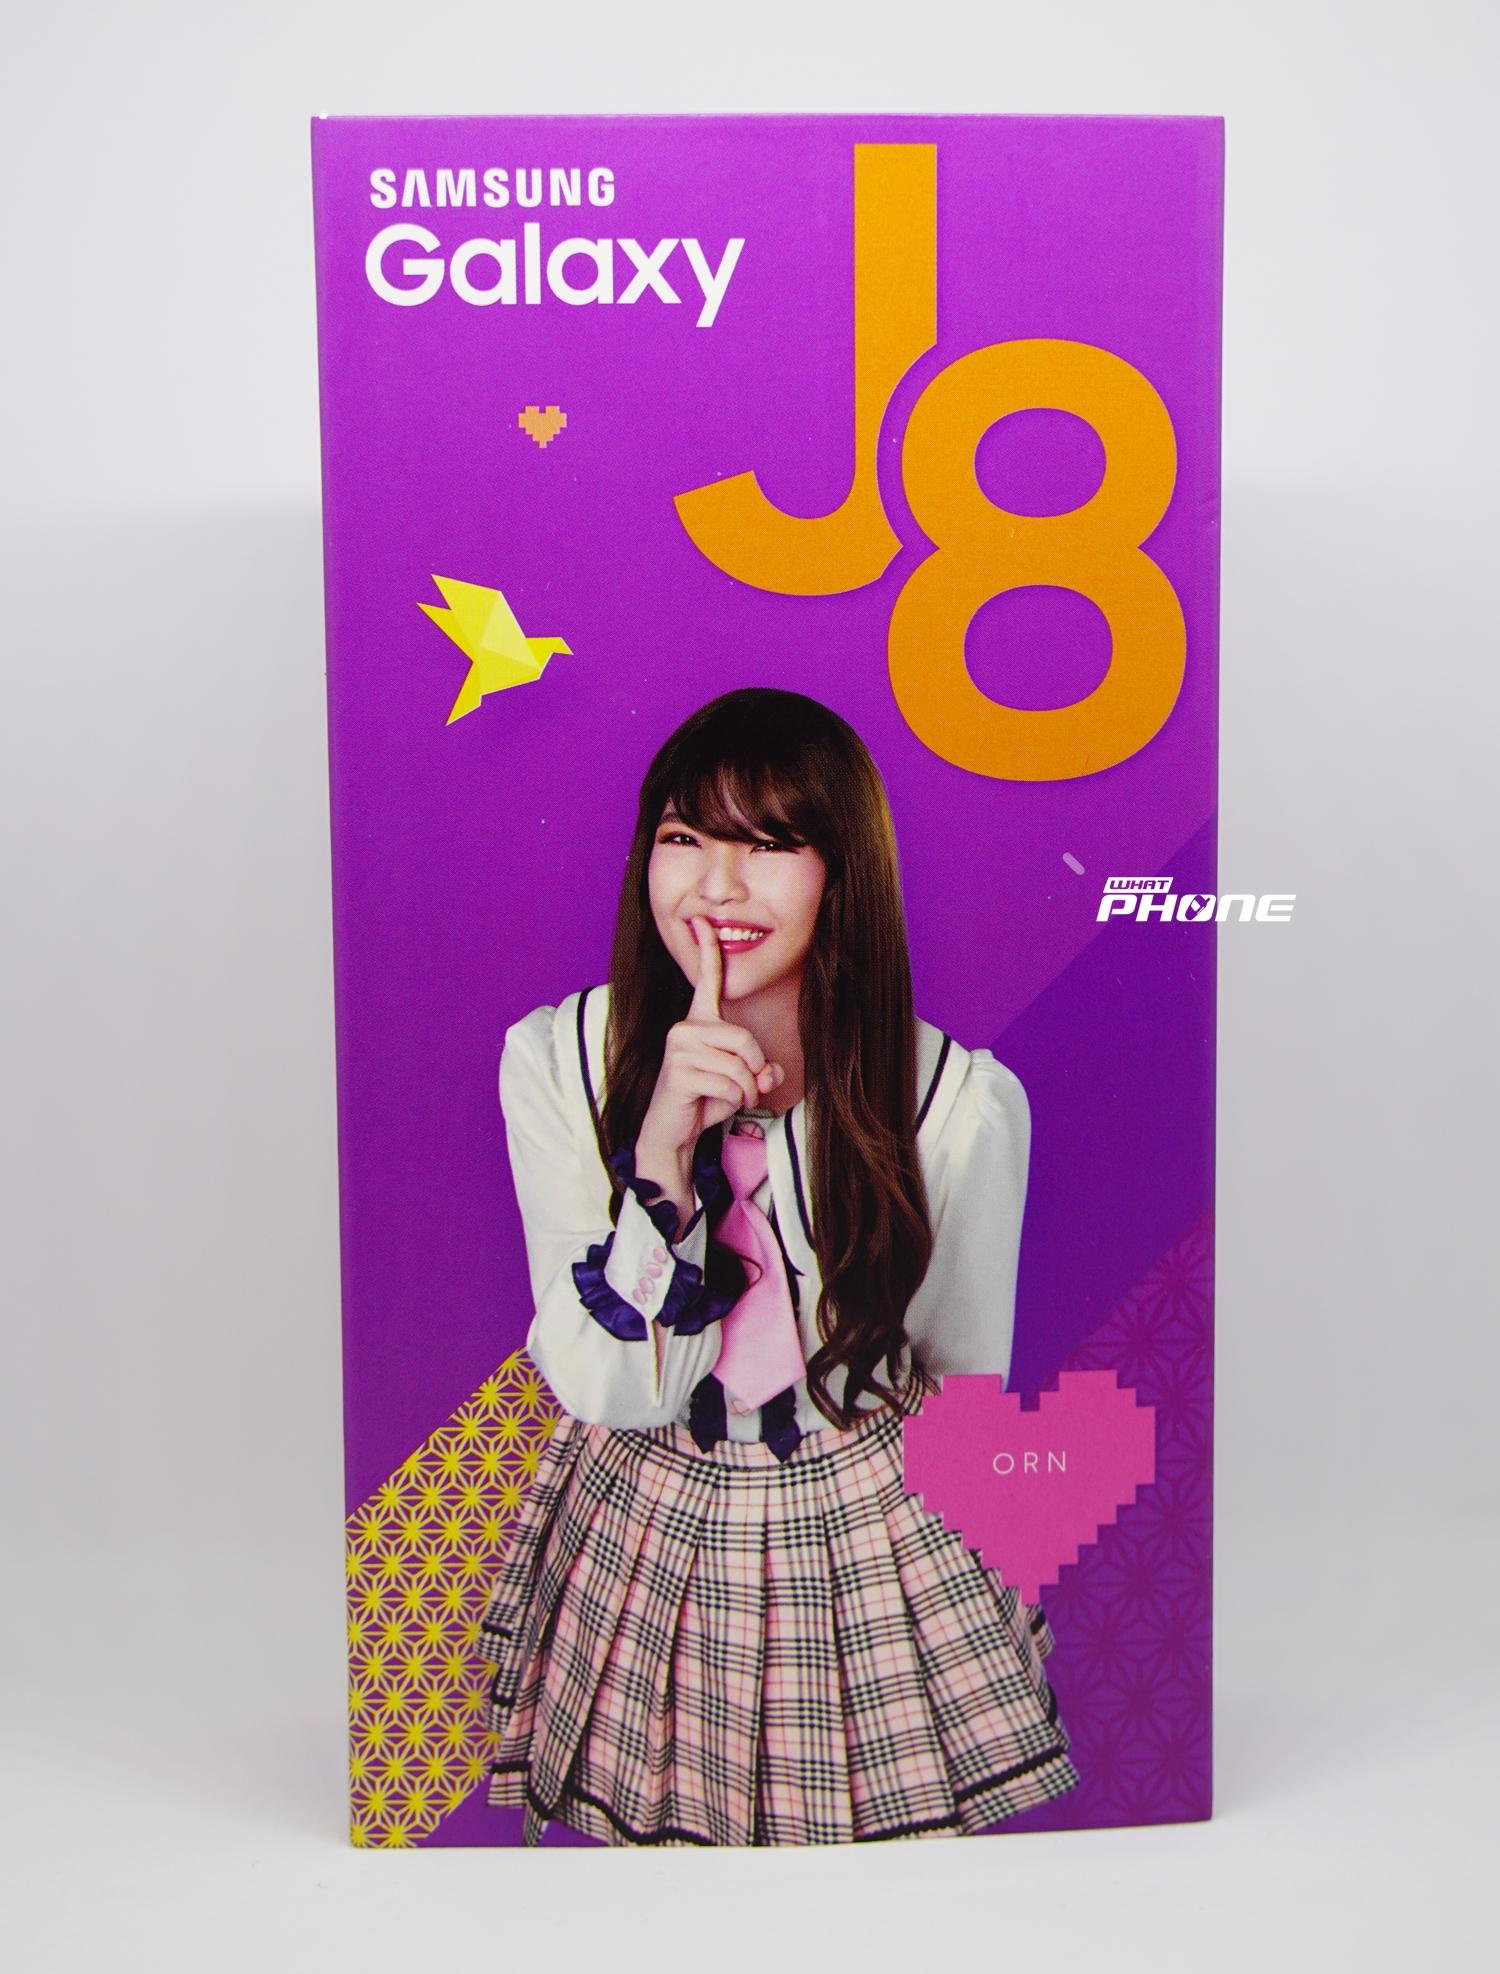 Samsung Galaxy J8 x BNK48 Limited Edition BOXSET Unboxing (26)